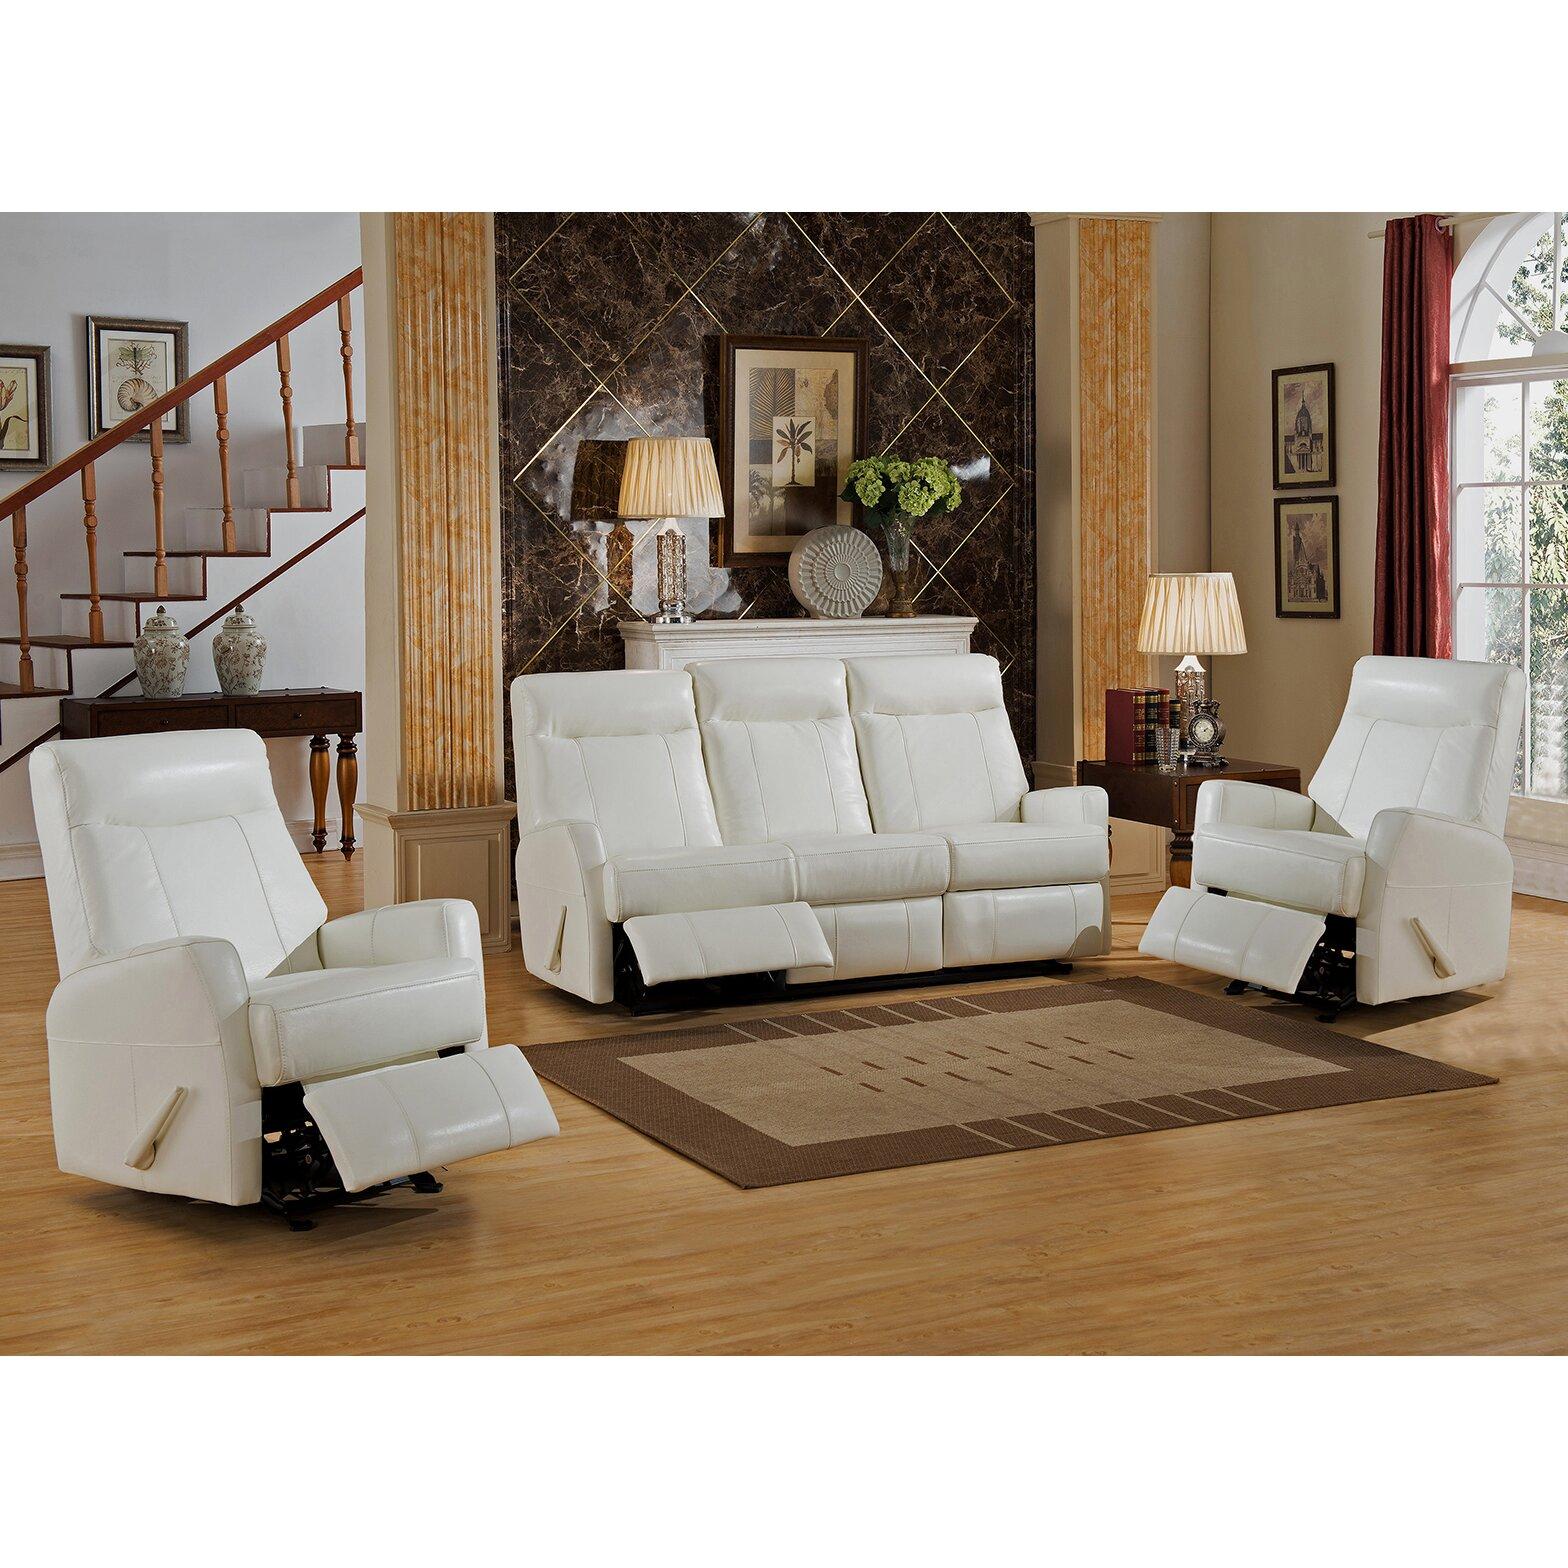 Amax toledo 3 piece leather living room set wayfair for Three piece leather living room set